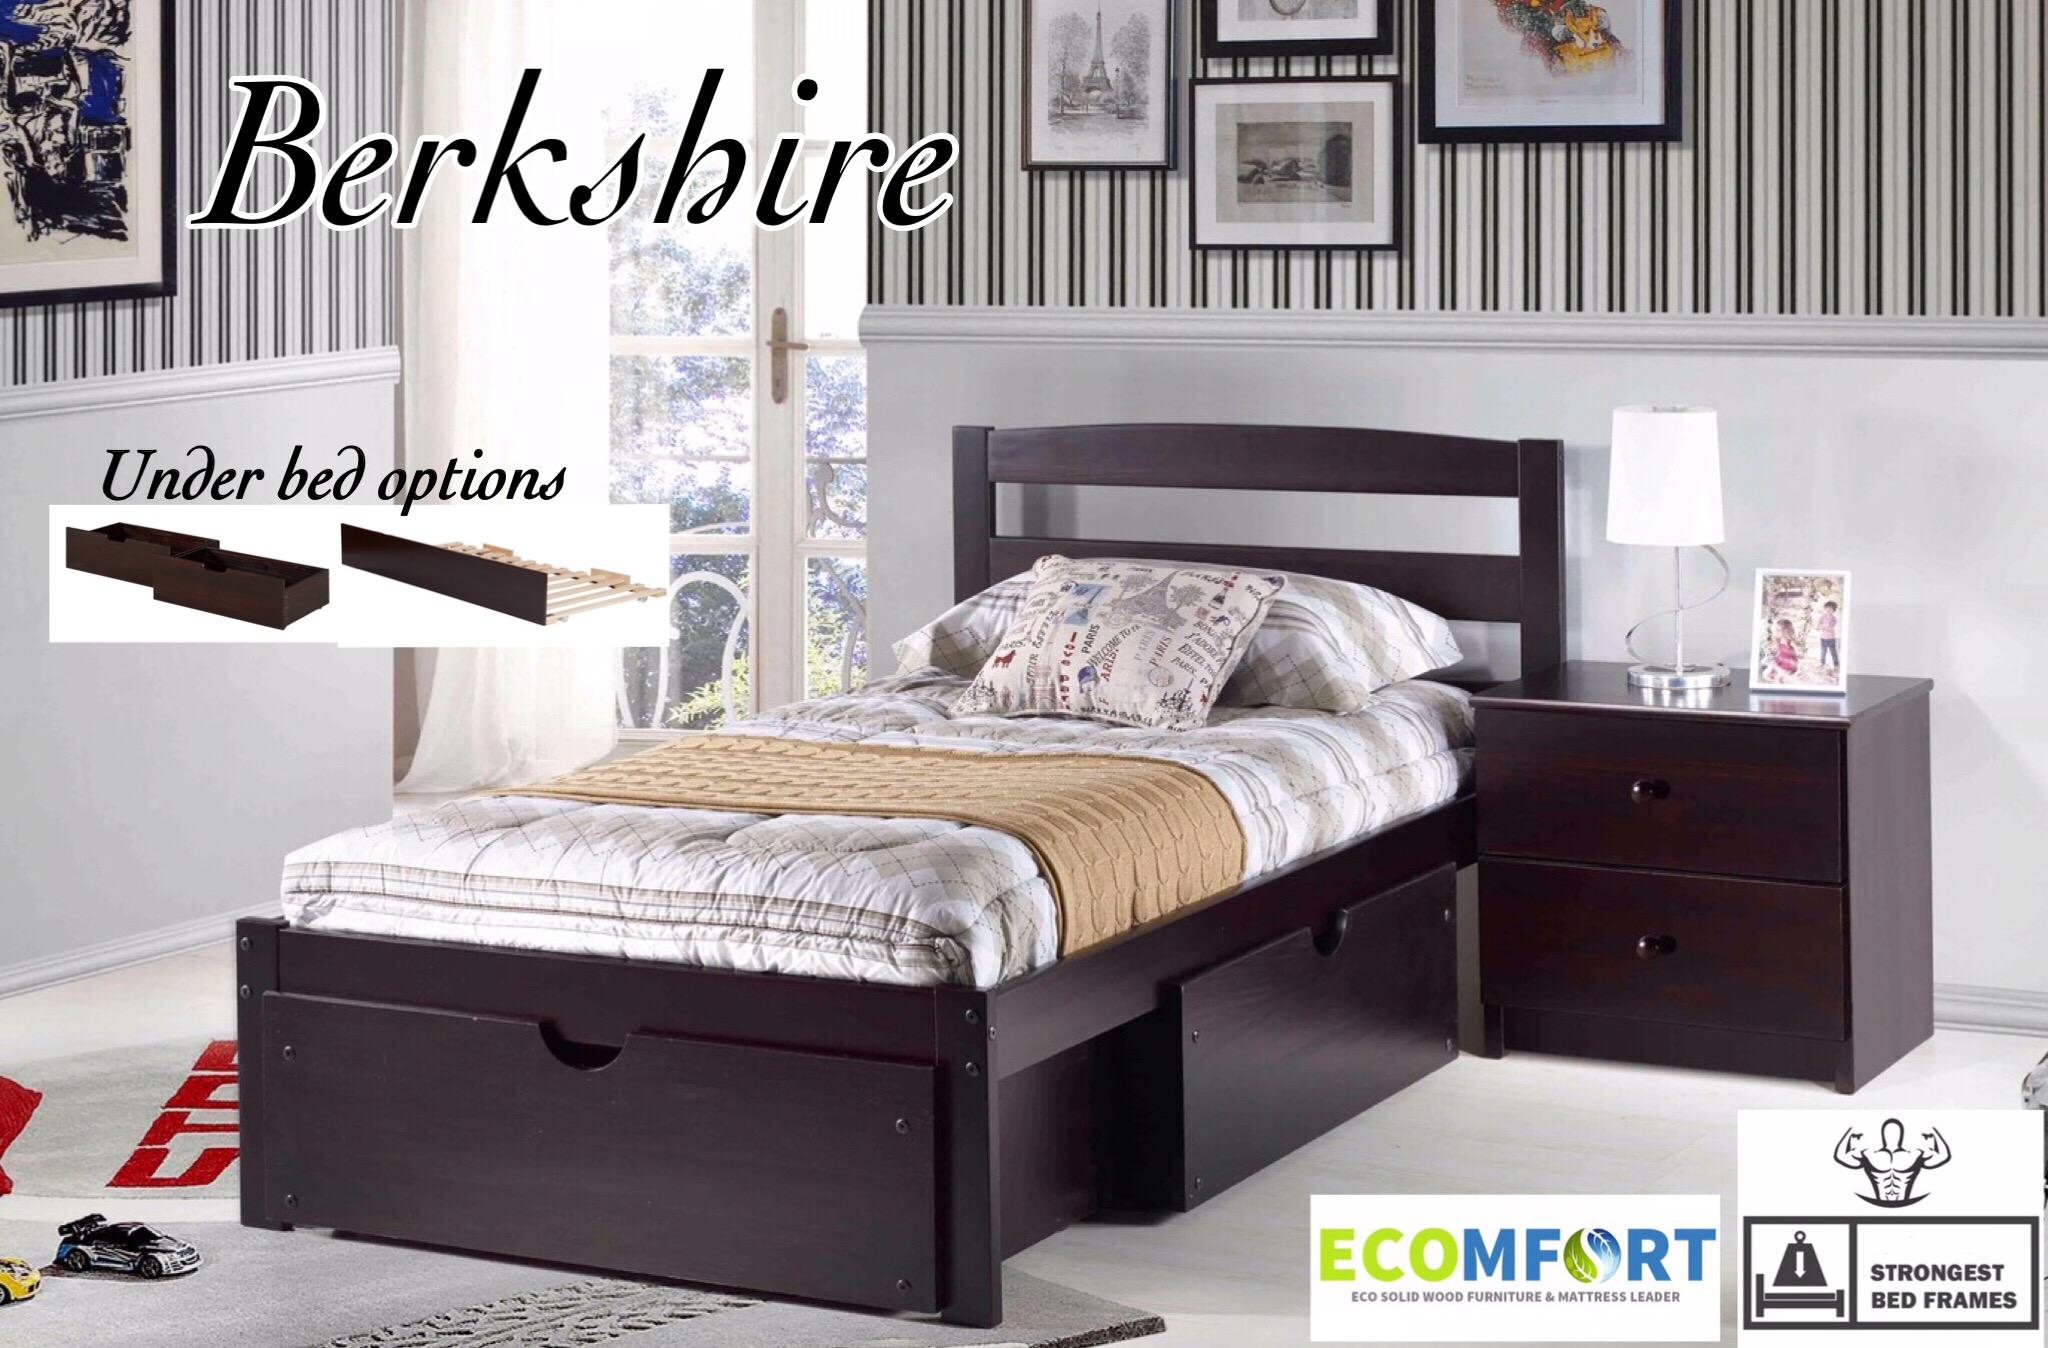 Platform Bedberkshire Solid Wood Bed Shown In Espresso With Optional Underbed Storage Drawersbunk